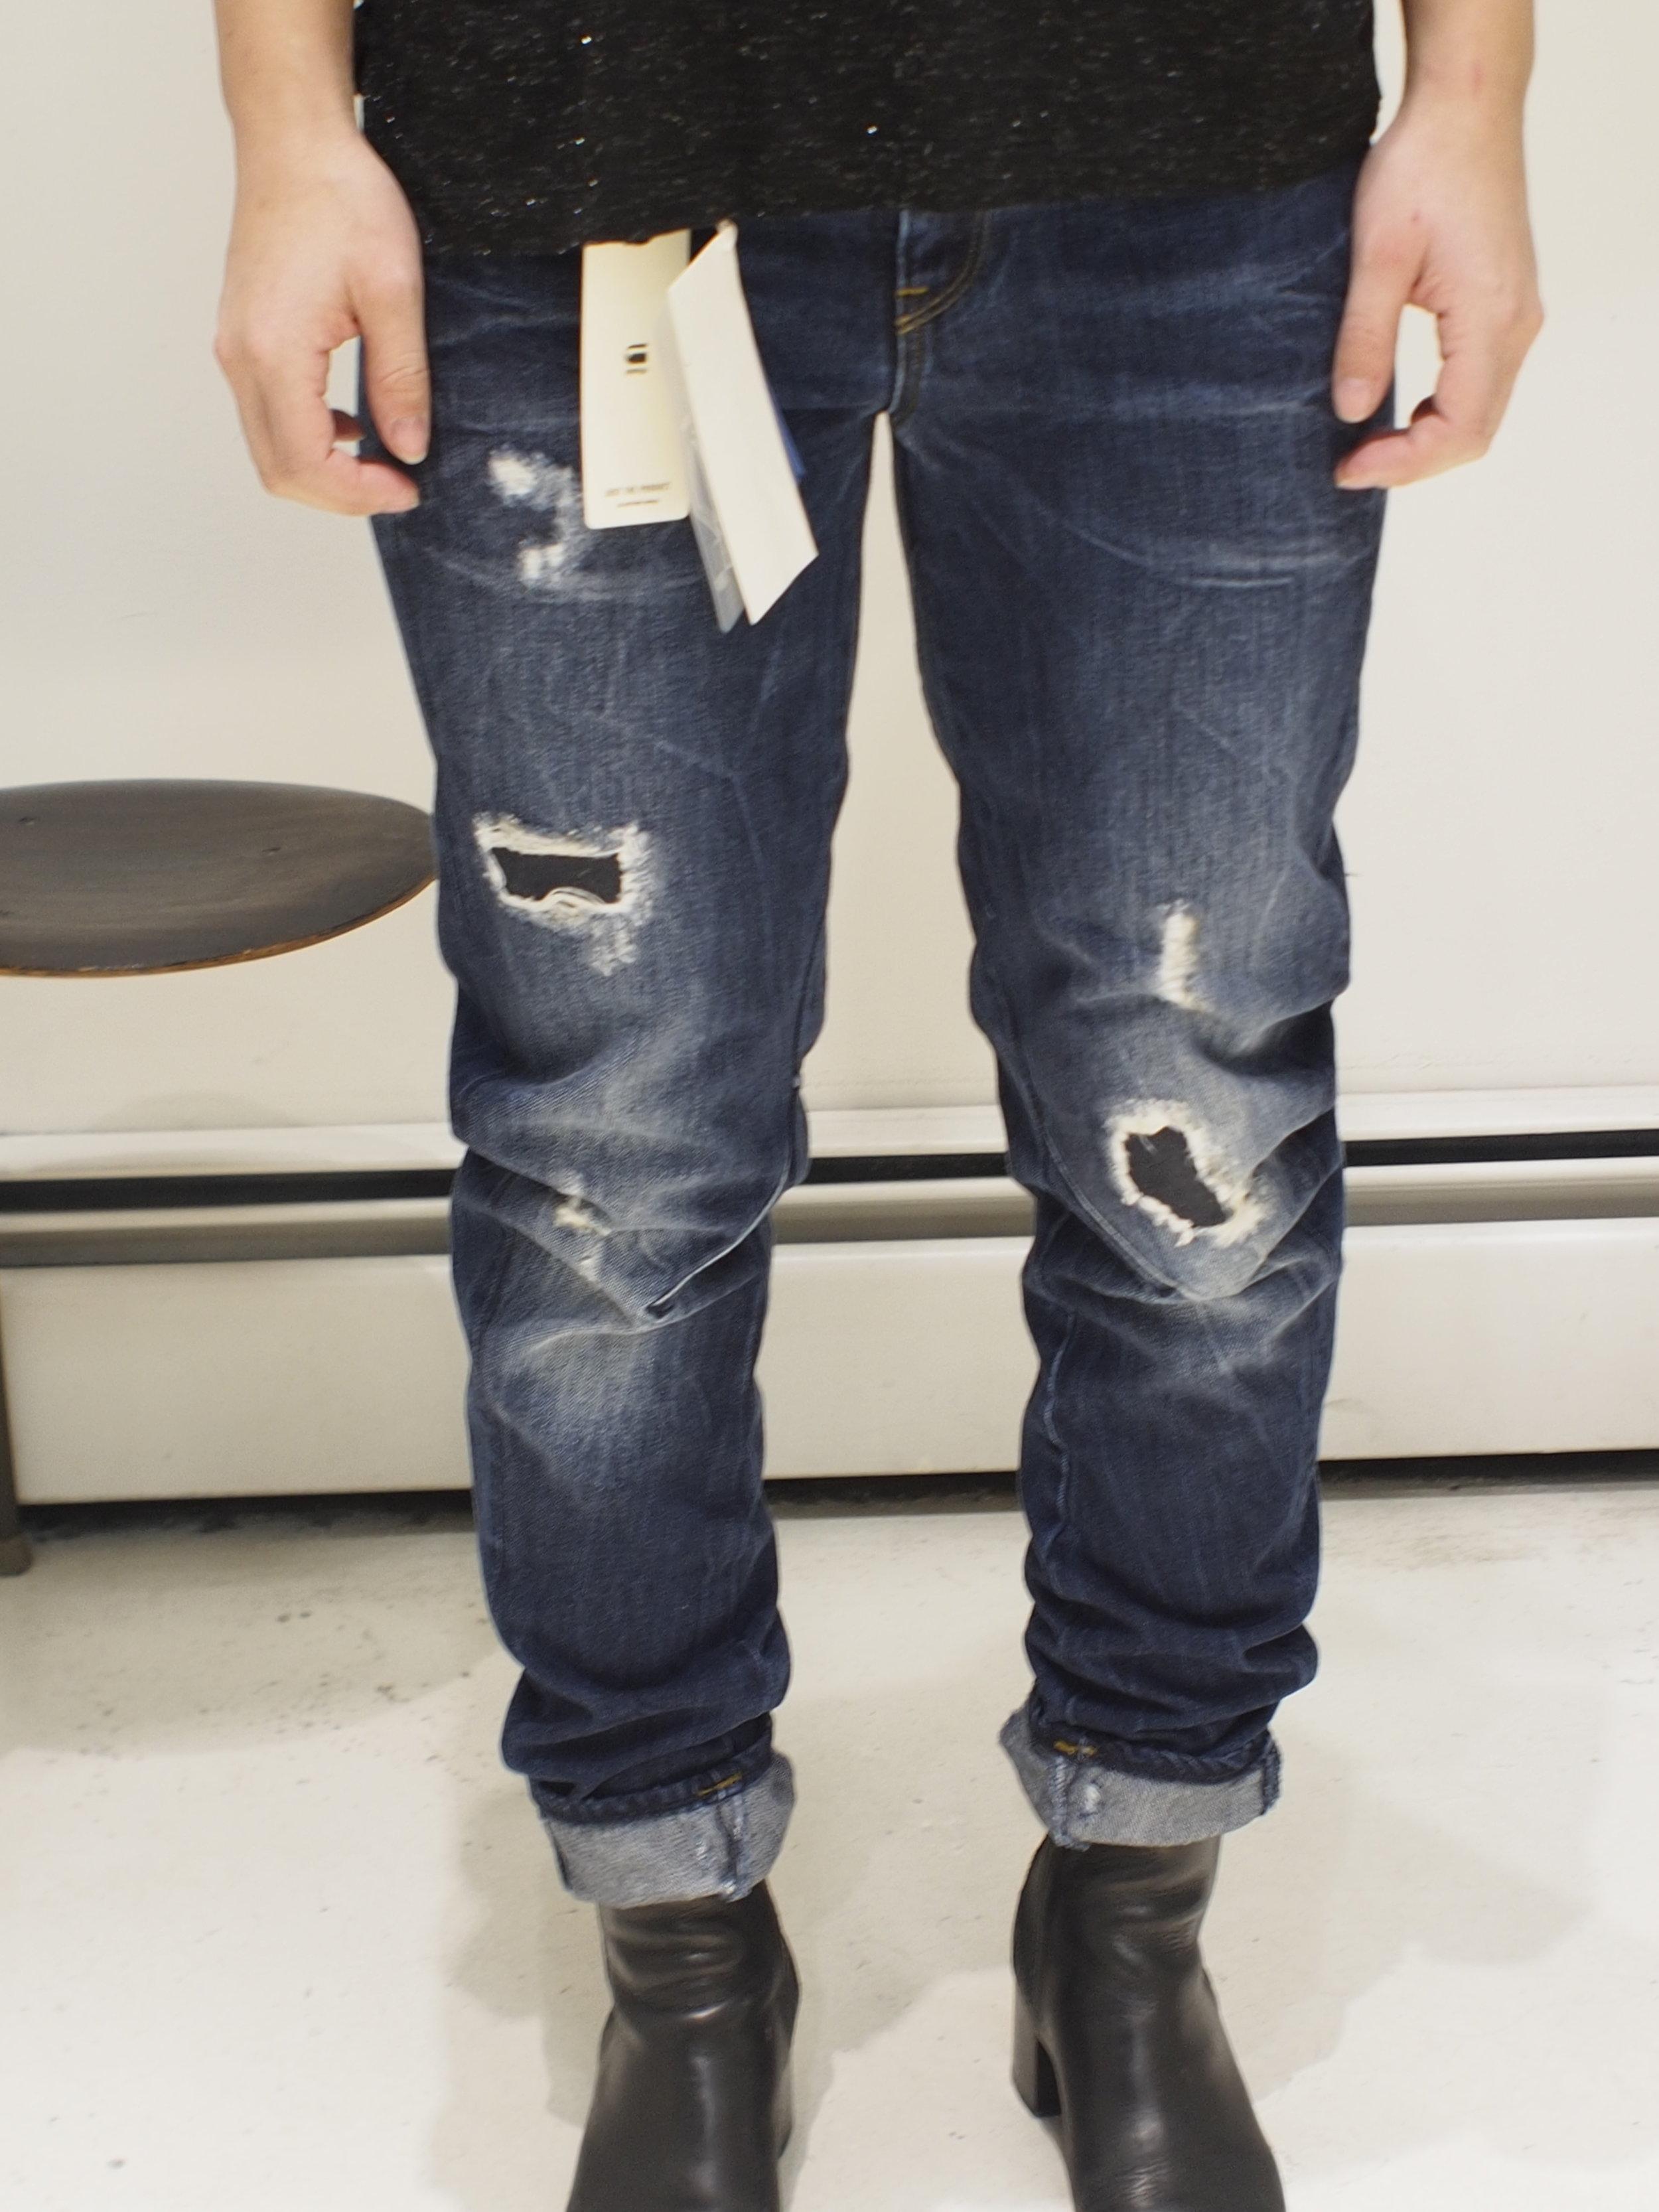 b1ff052cb38f G-Star ARC 3D Low Boyfriend Jeans - Dark Aged Restored 106 — global ...